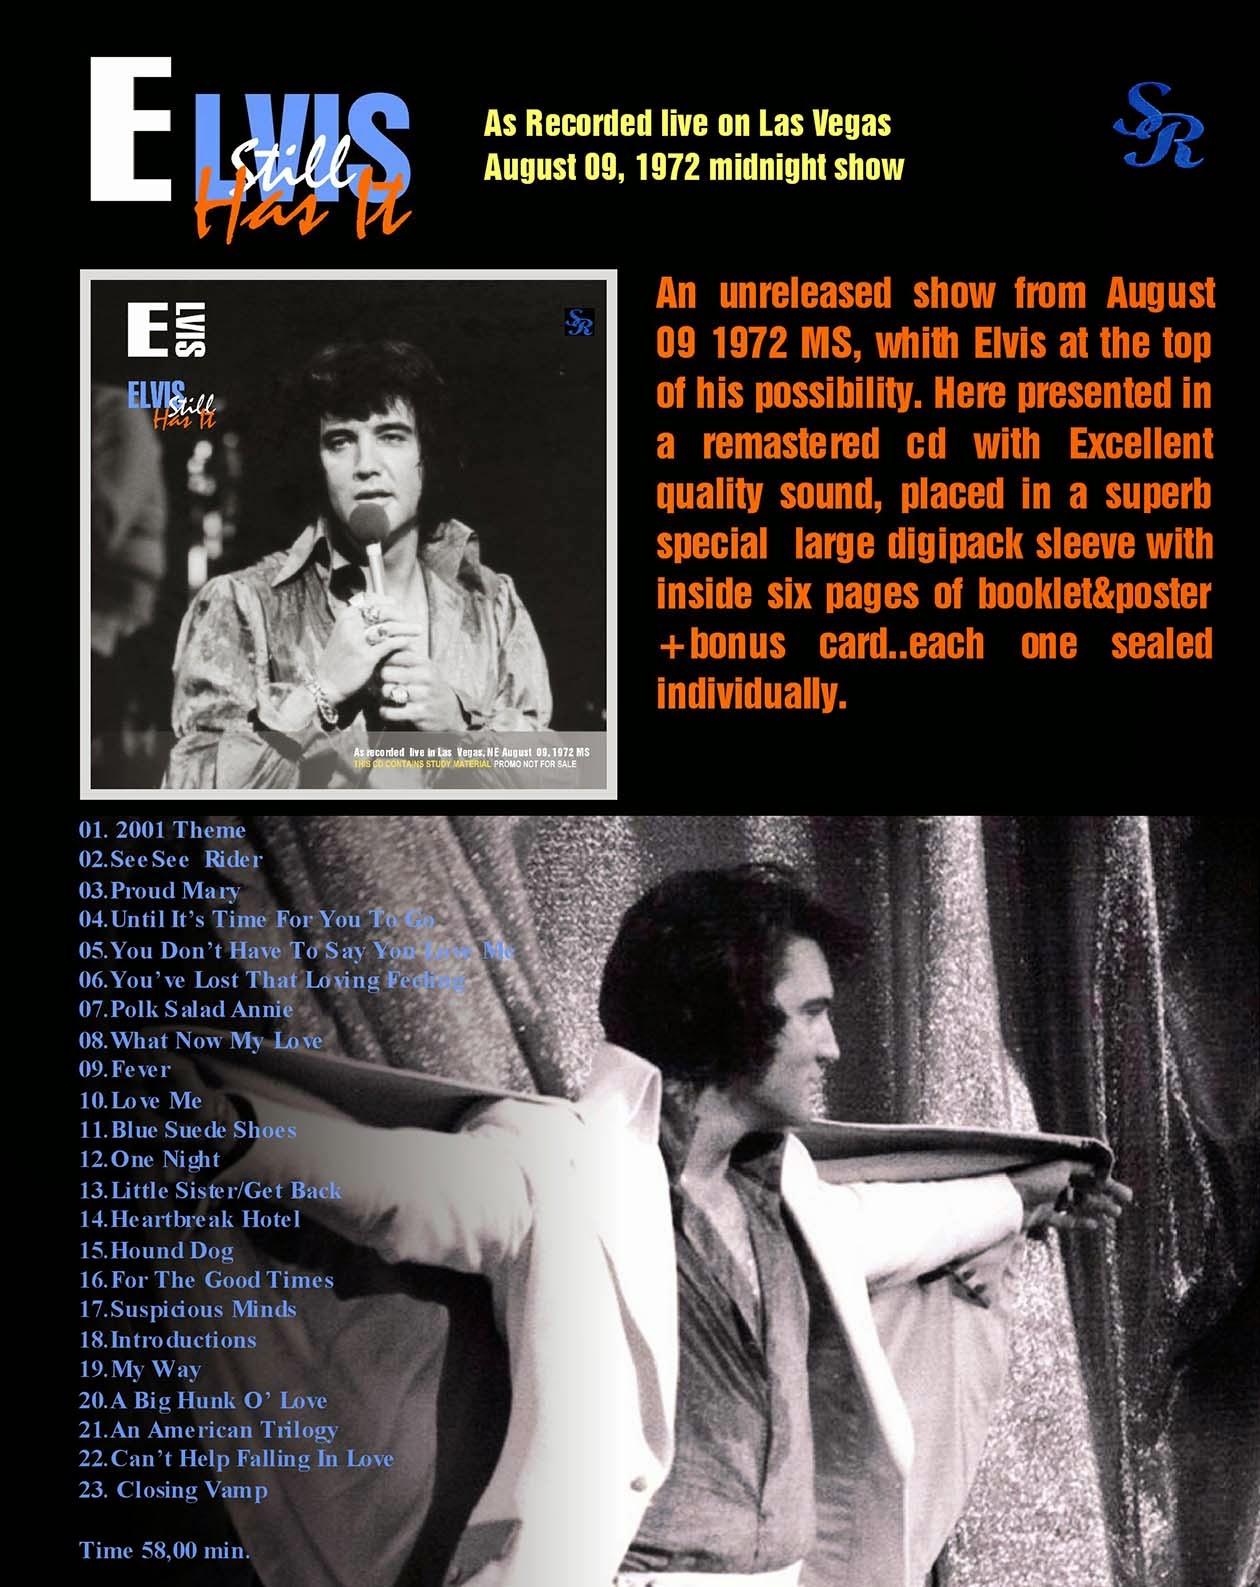 Elvis Presley 1972 Las Vegas Show Poster